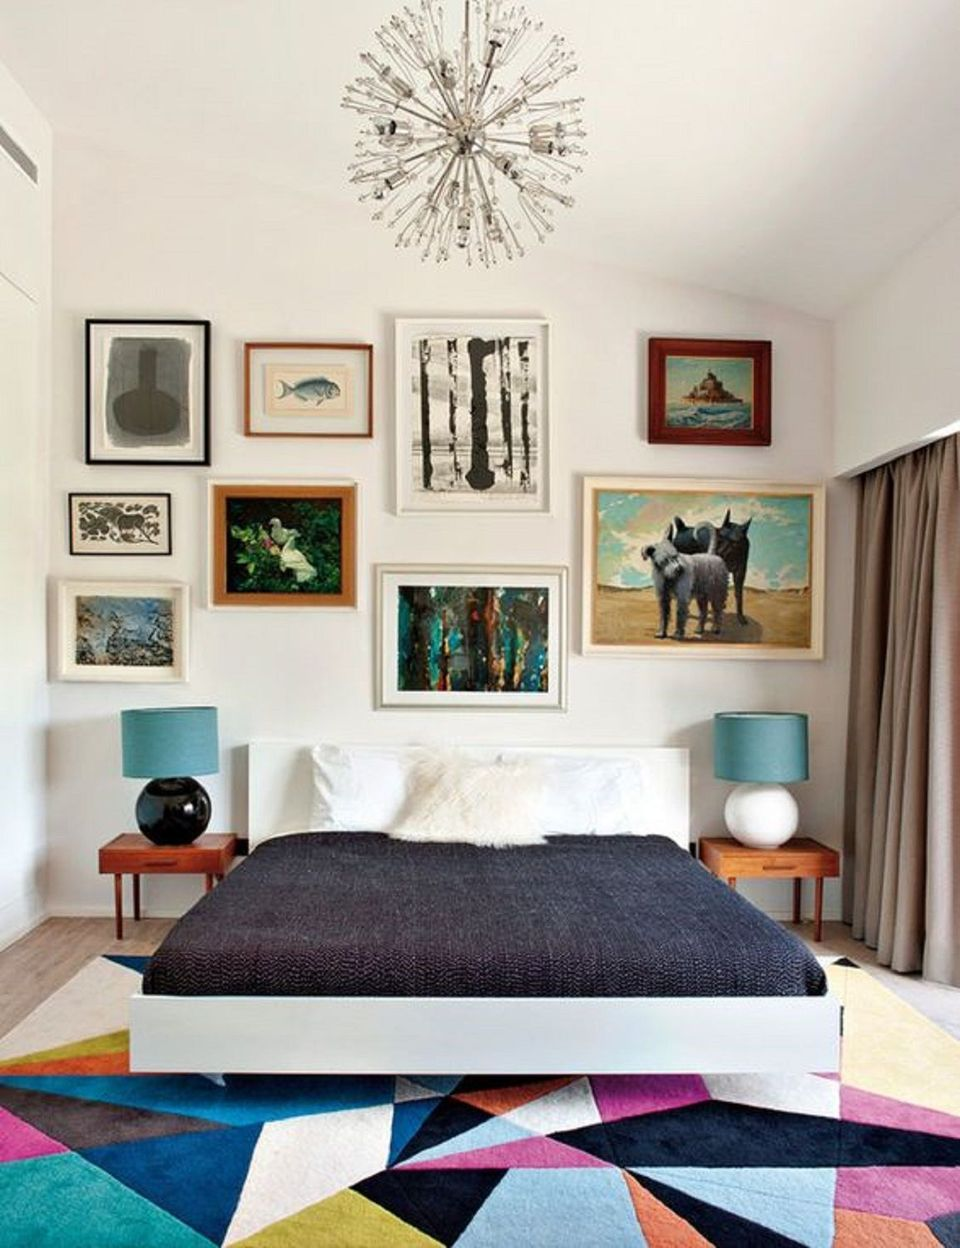 25 gorgeous midcentury modern bedrooms home design inspiration rh pinterest com